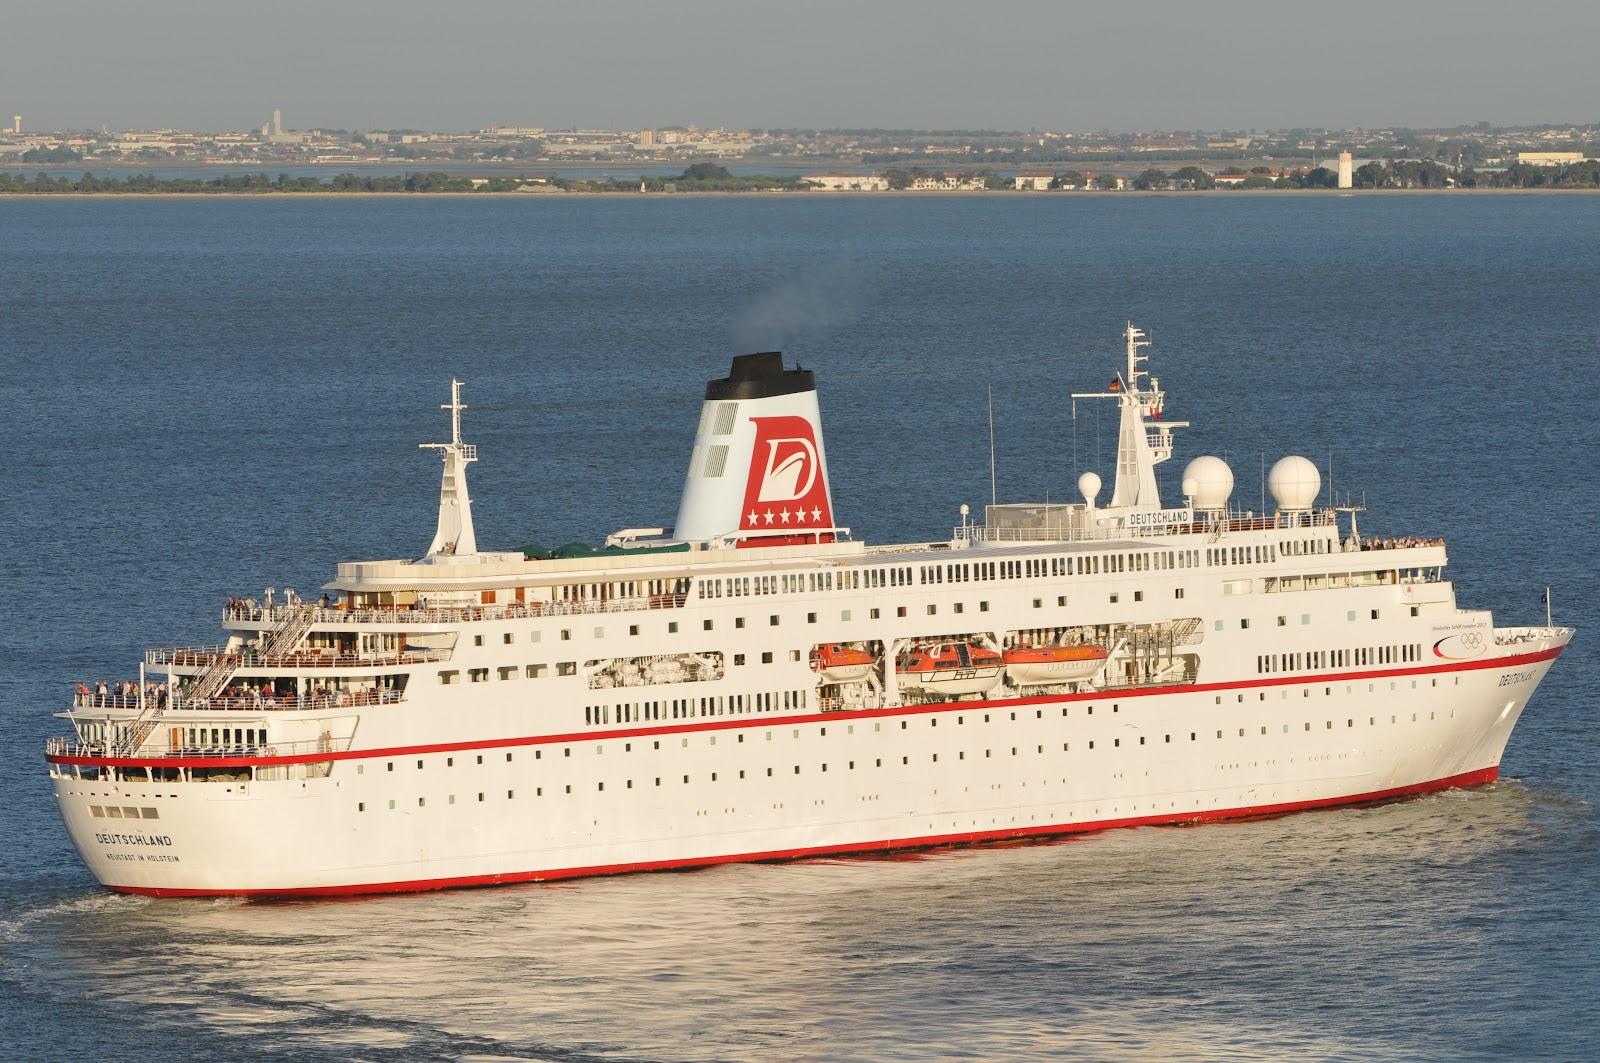 LISBON CRUISE SHIPS DEUTSCHLAND In Lisbon